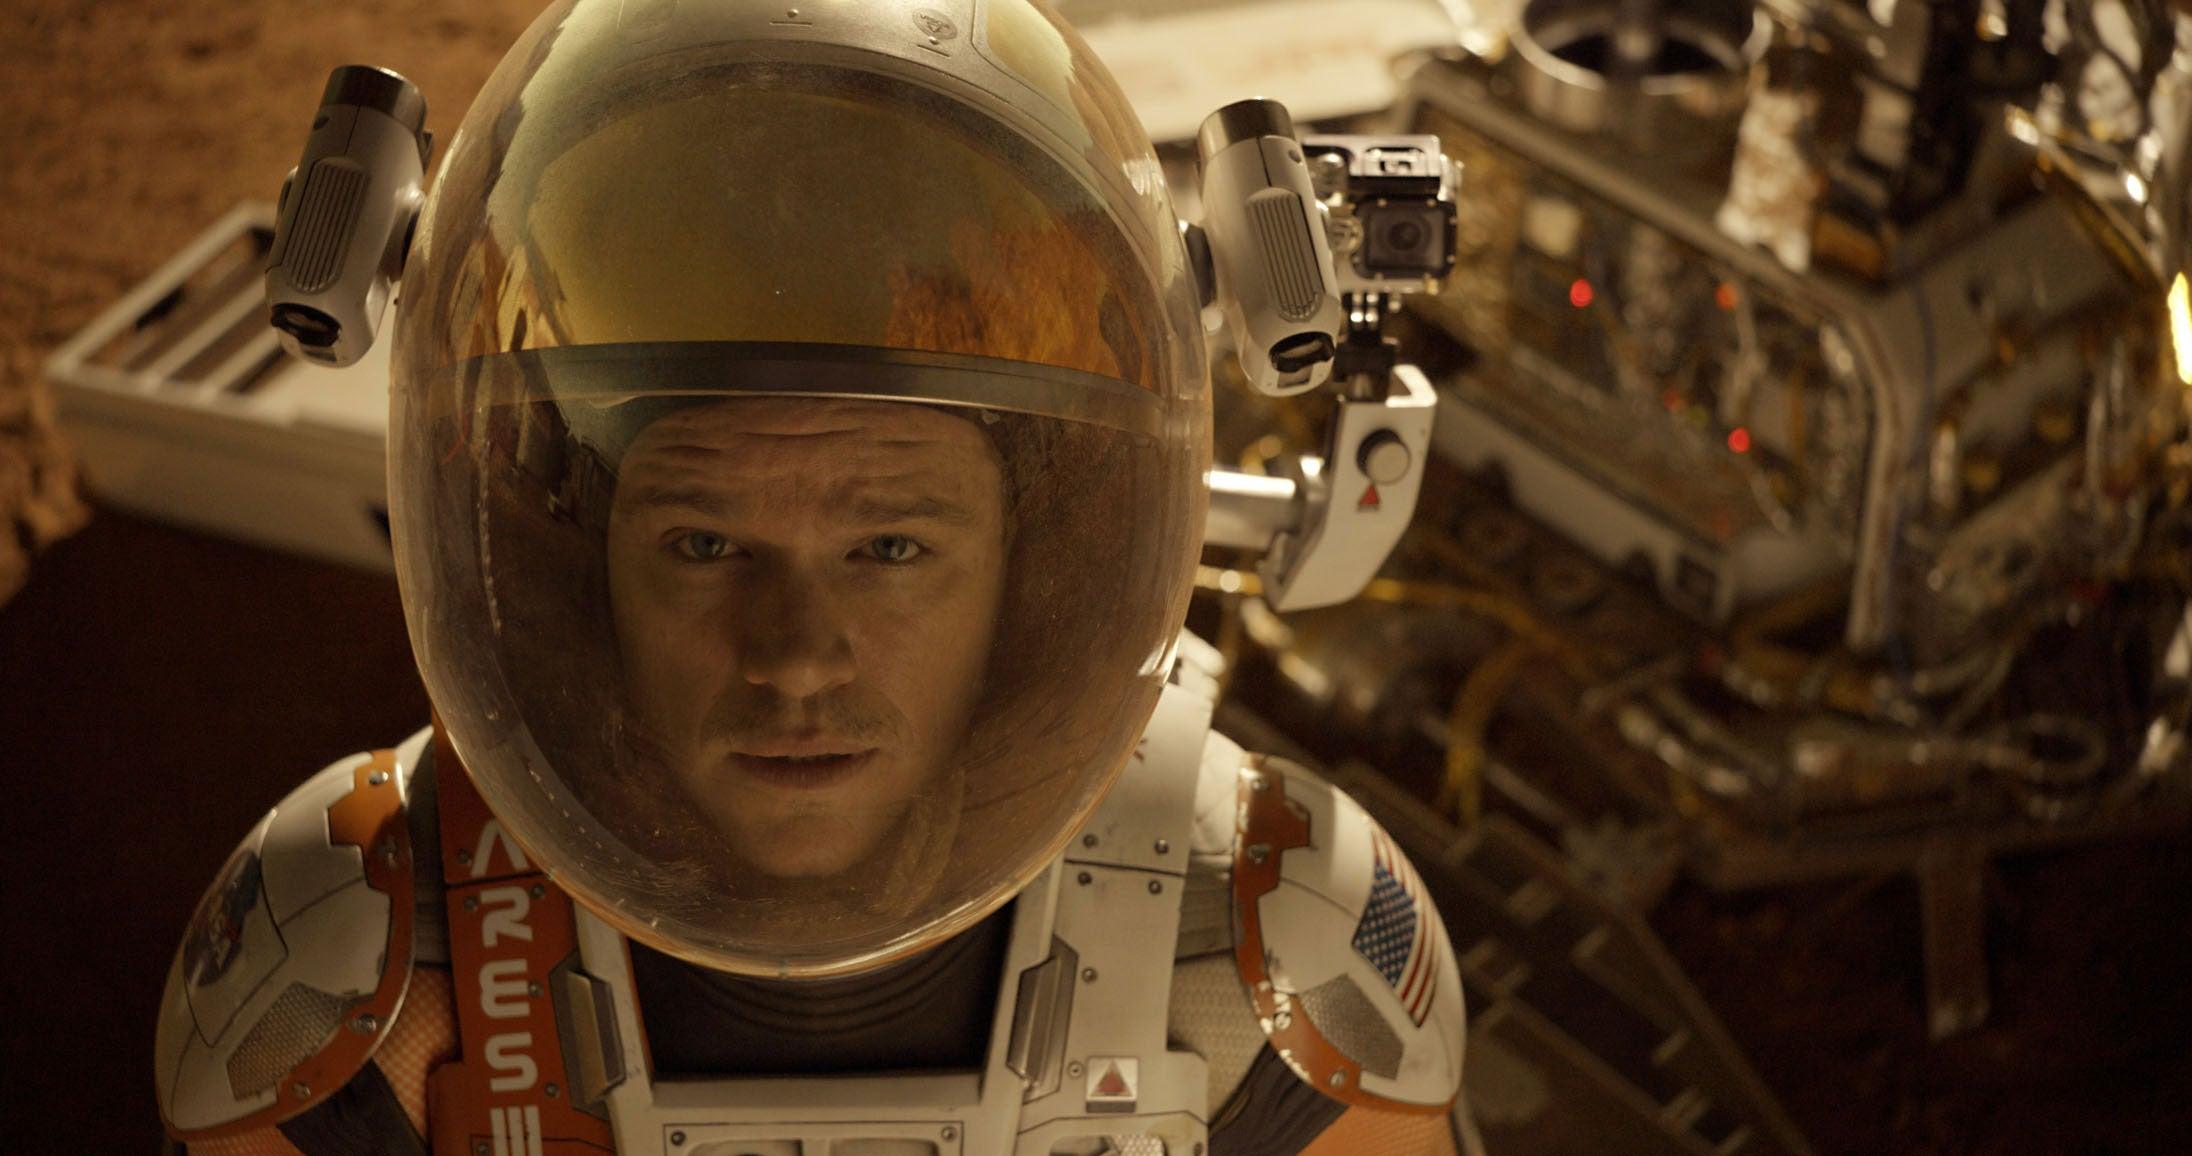 «The Martian» sigue en la cima de la taquilla norteamericana